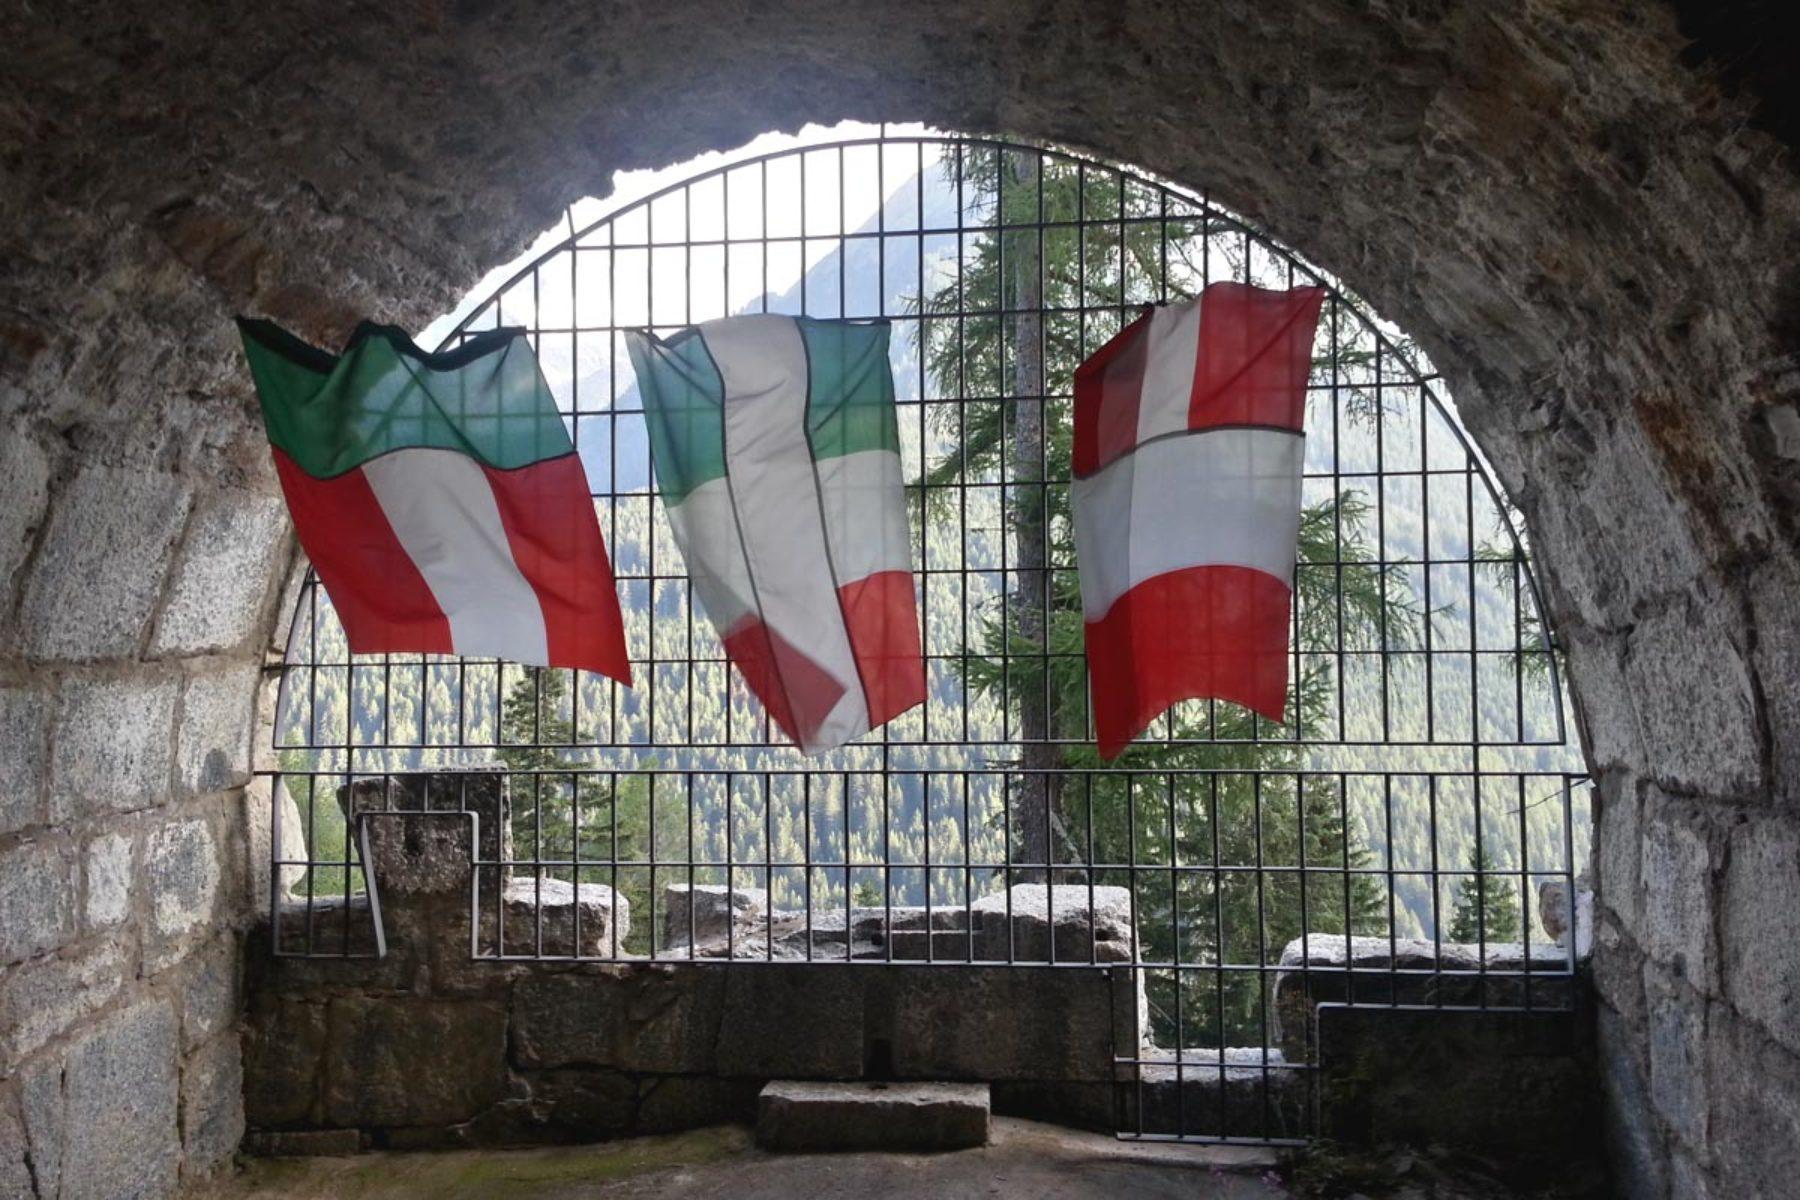 F. Lanaro, IT_A, 2013, sewn flags, installation view, 1